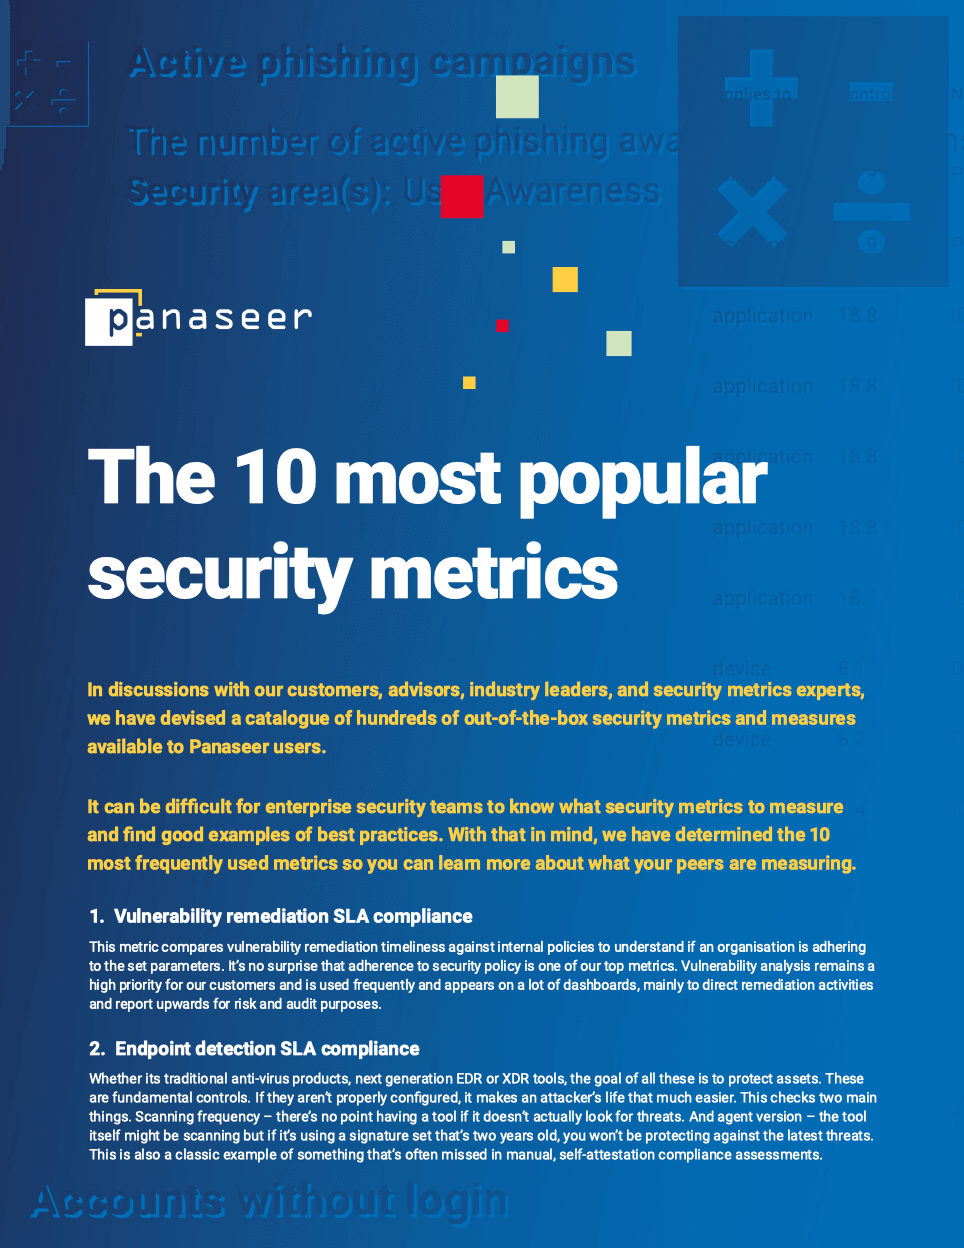 The 10 most popular security metrics